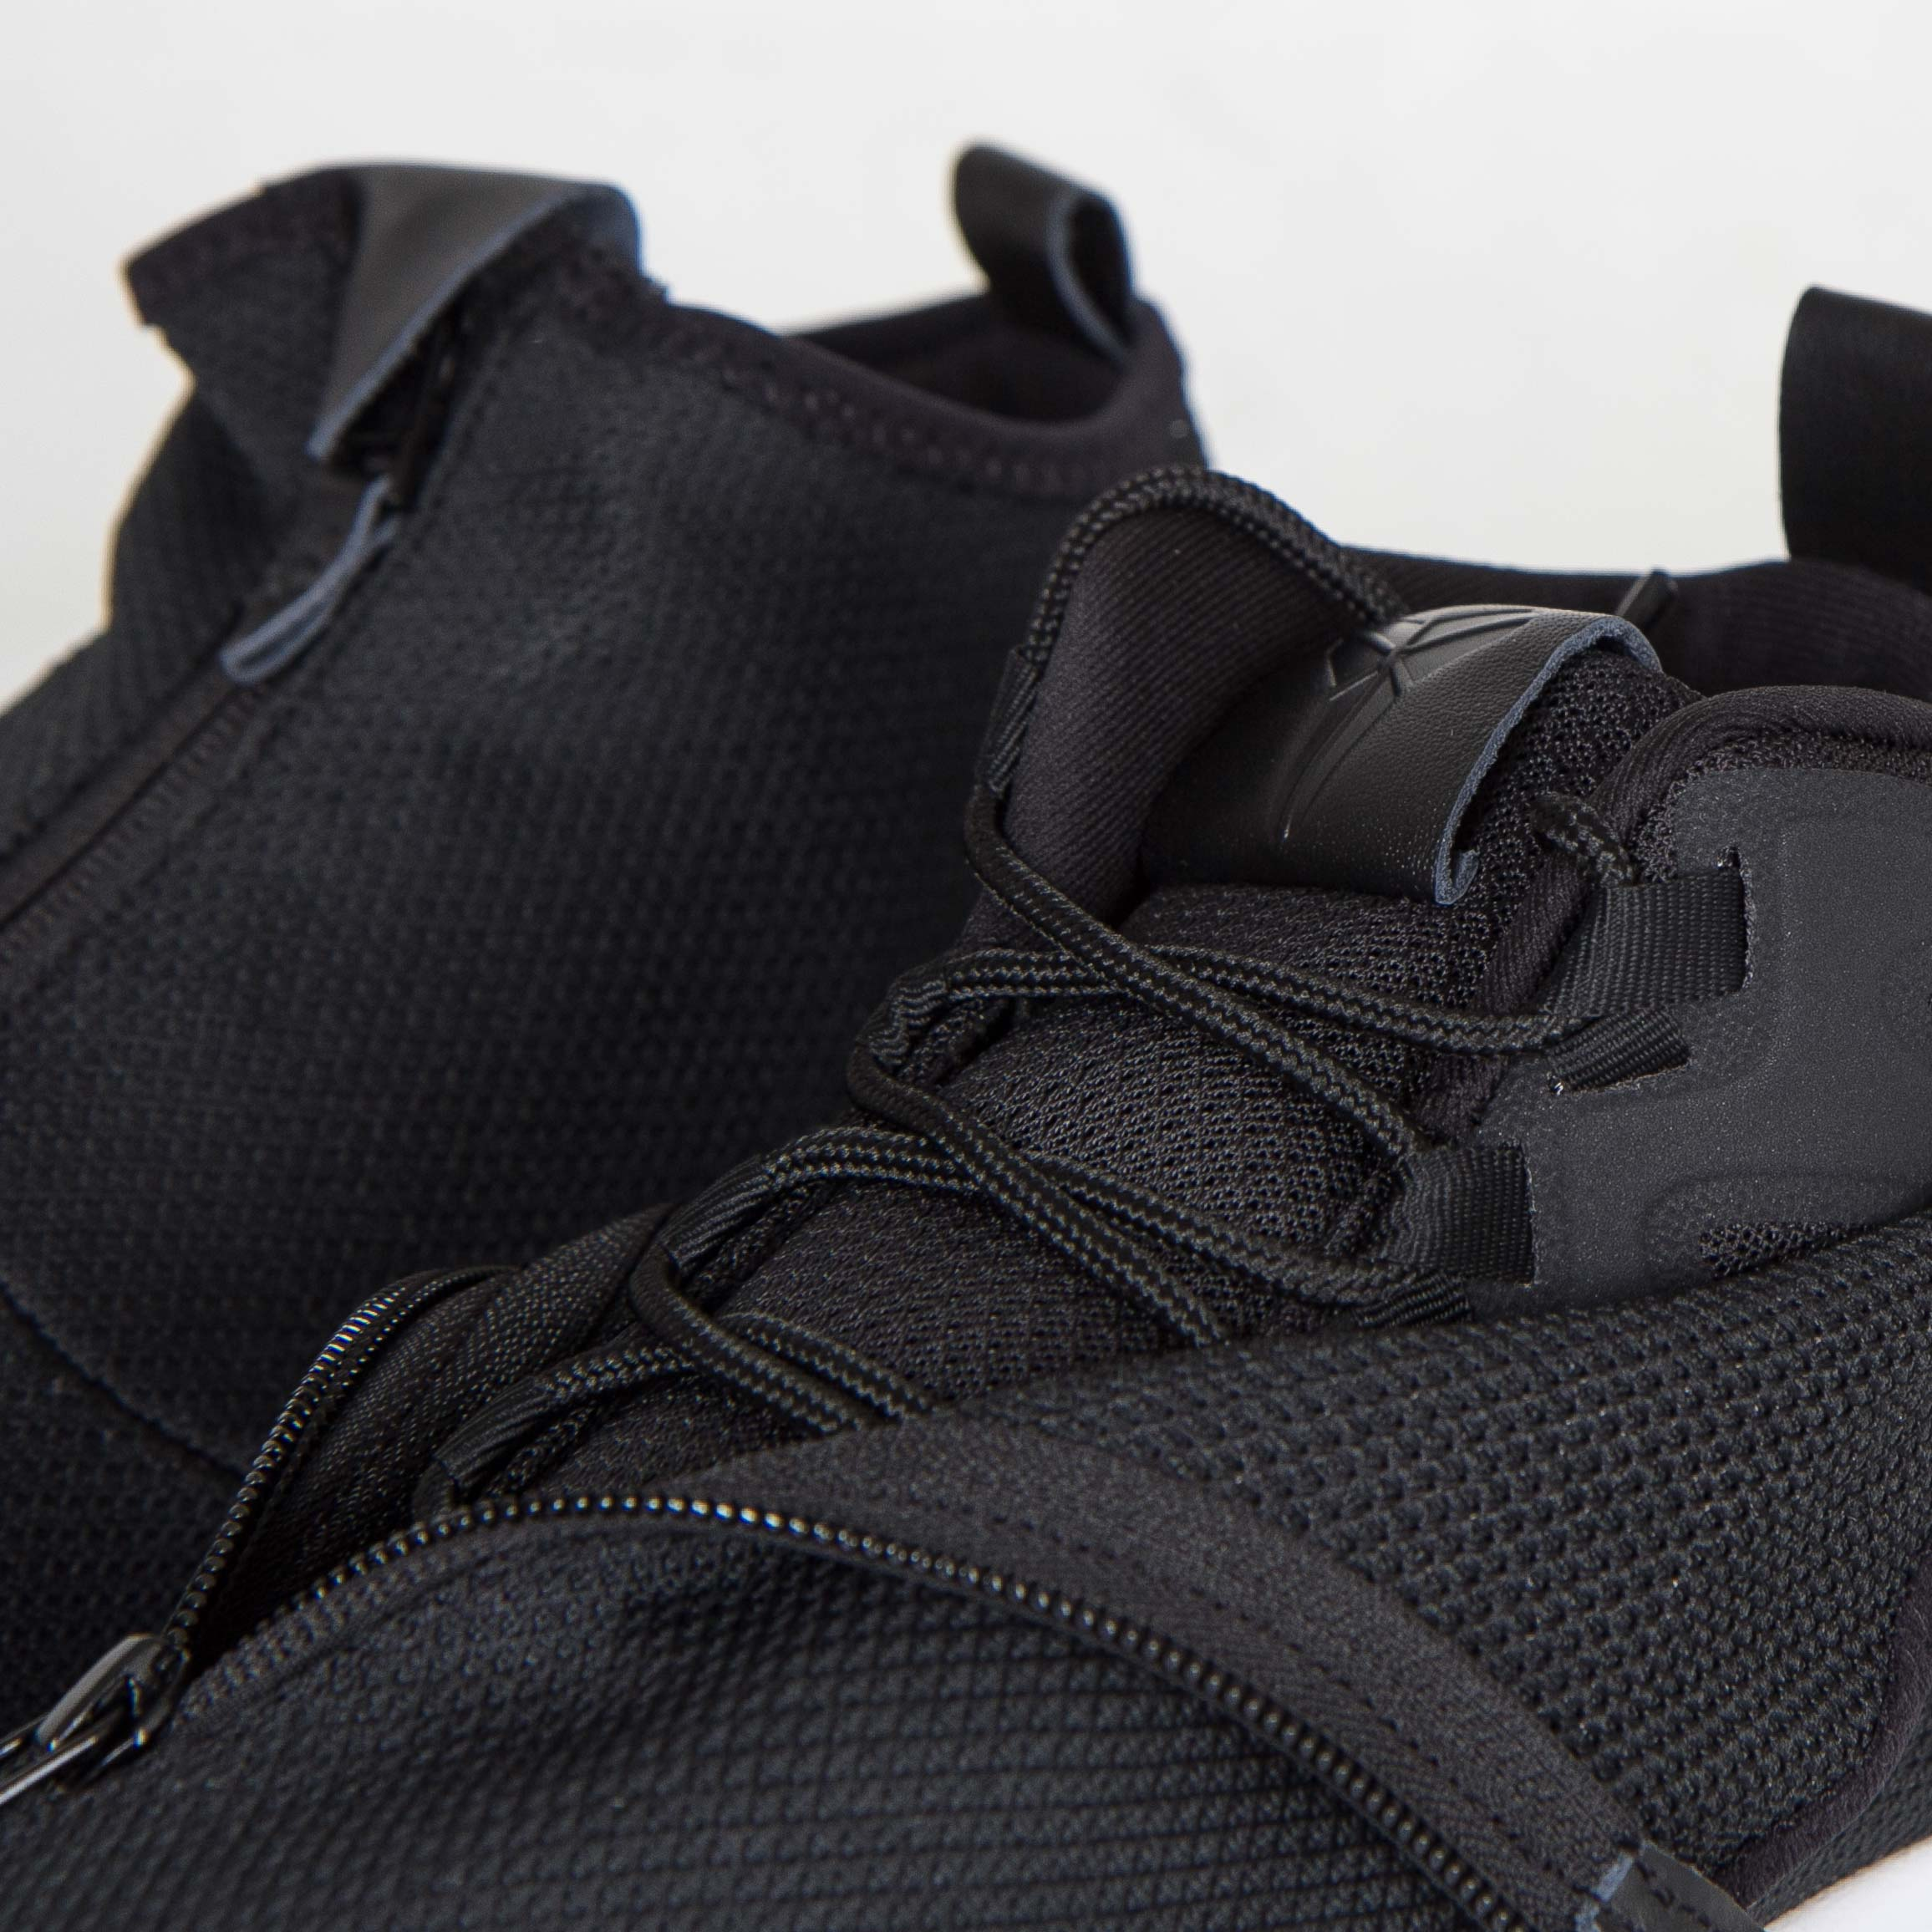 buy popular 51013 9c965 Nike Zoom Kobe Icon - 818583-001 - Sneakersnstuff   sneakers   streetwear  online since 1999